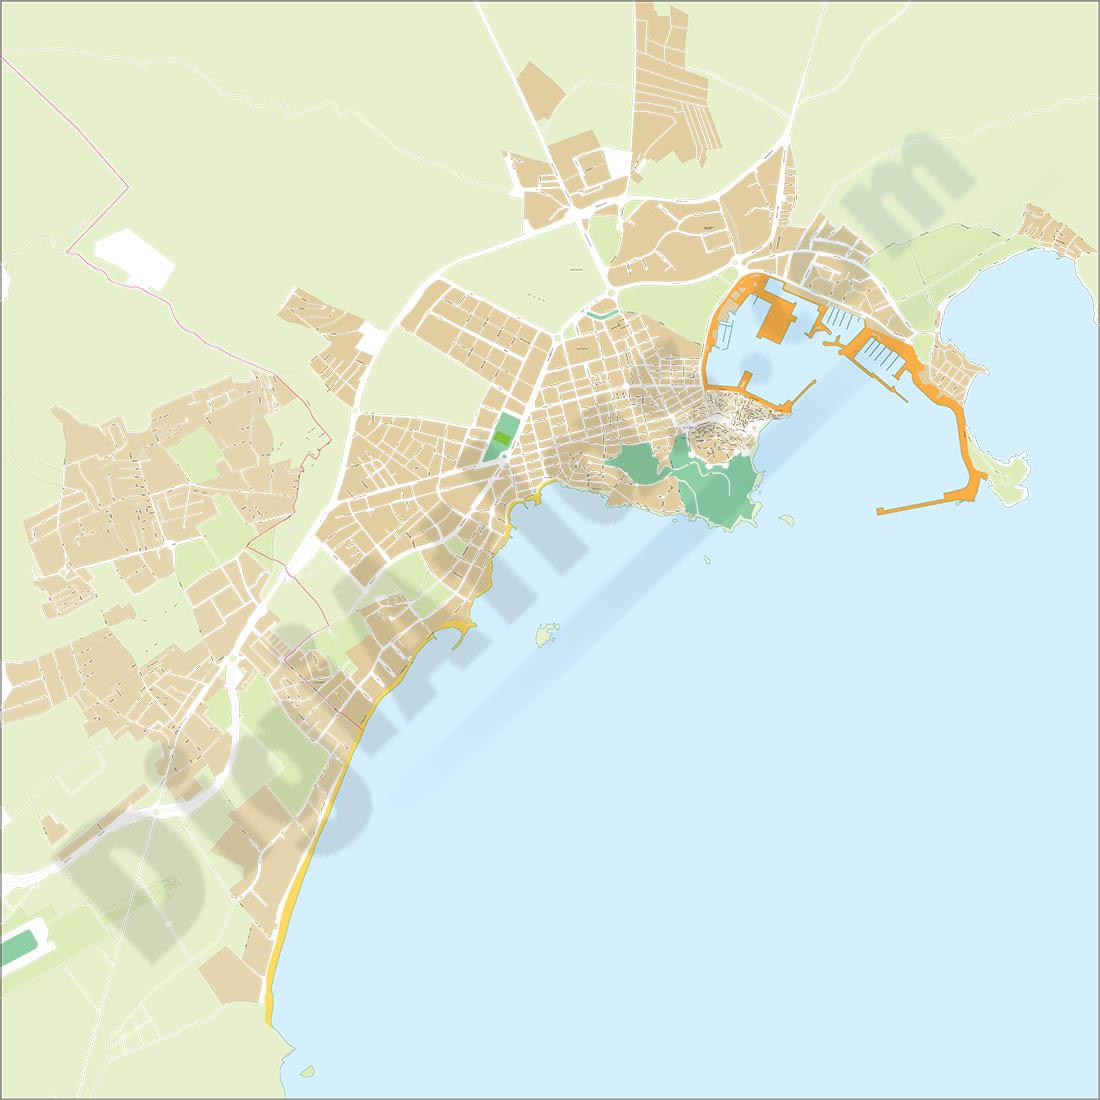 Eivissa ibiza balearic islands spain city map